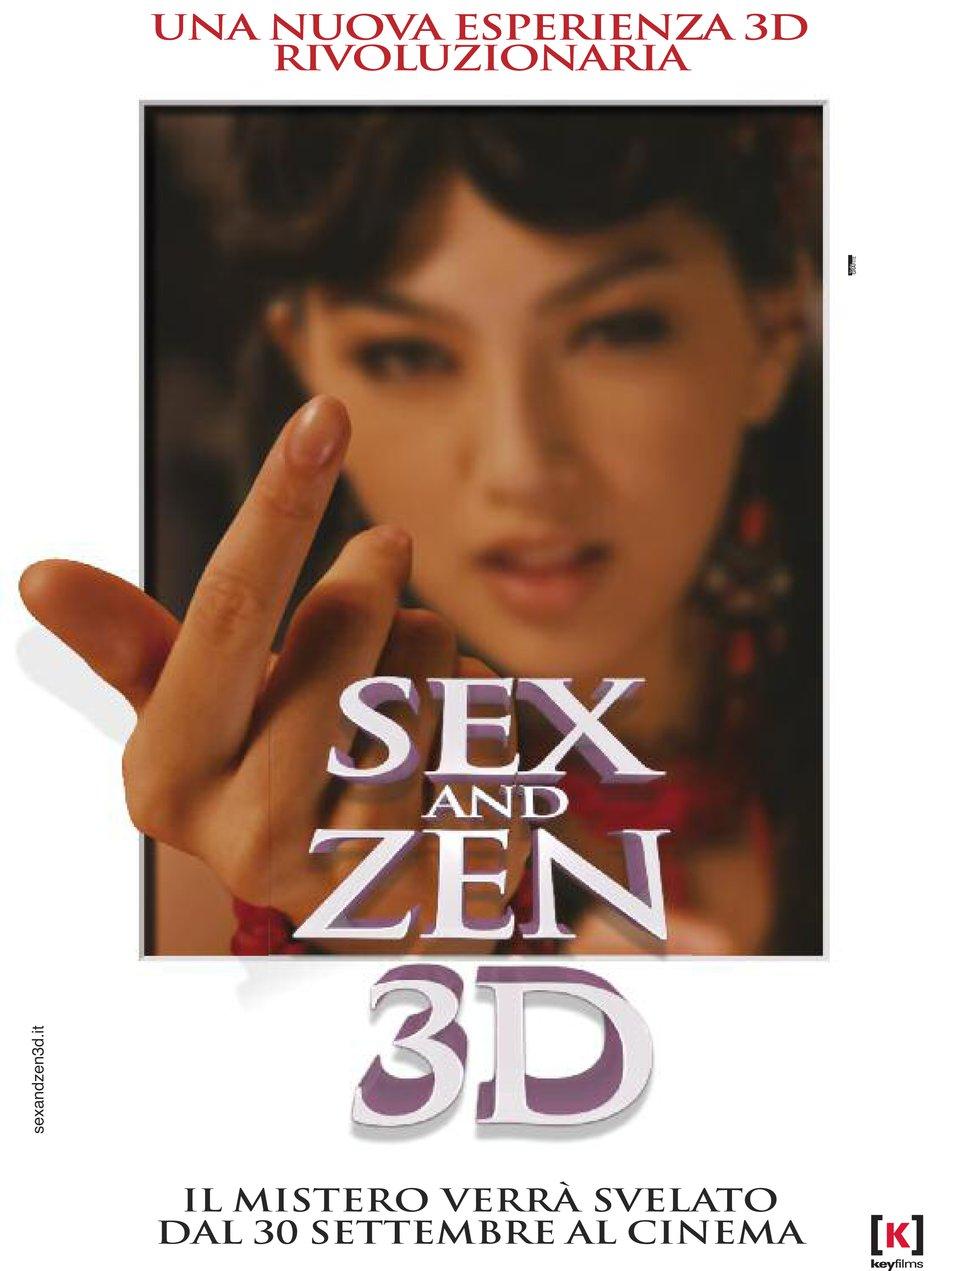 3d sex and zen extreme rapidshare